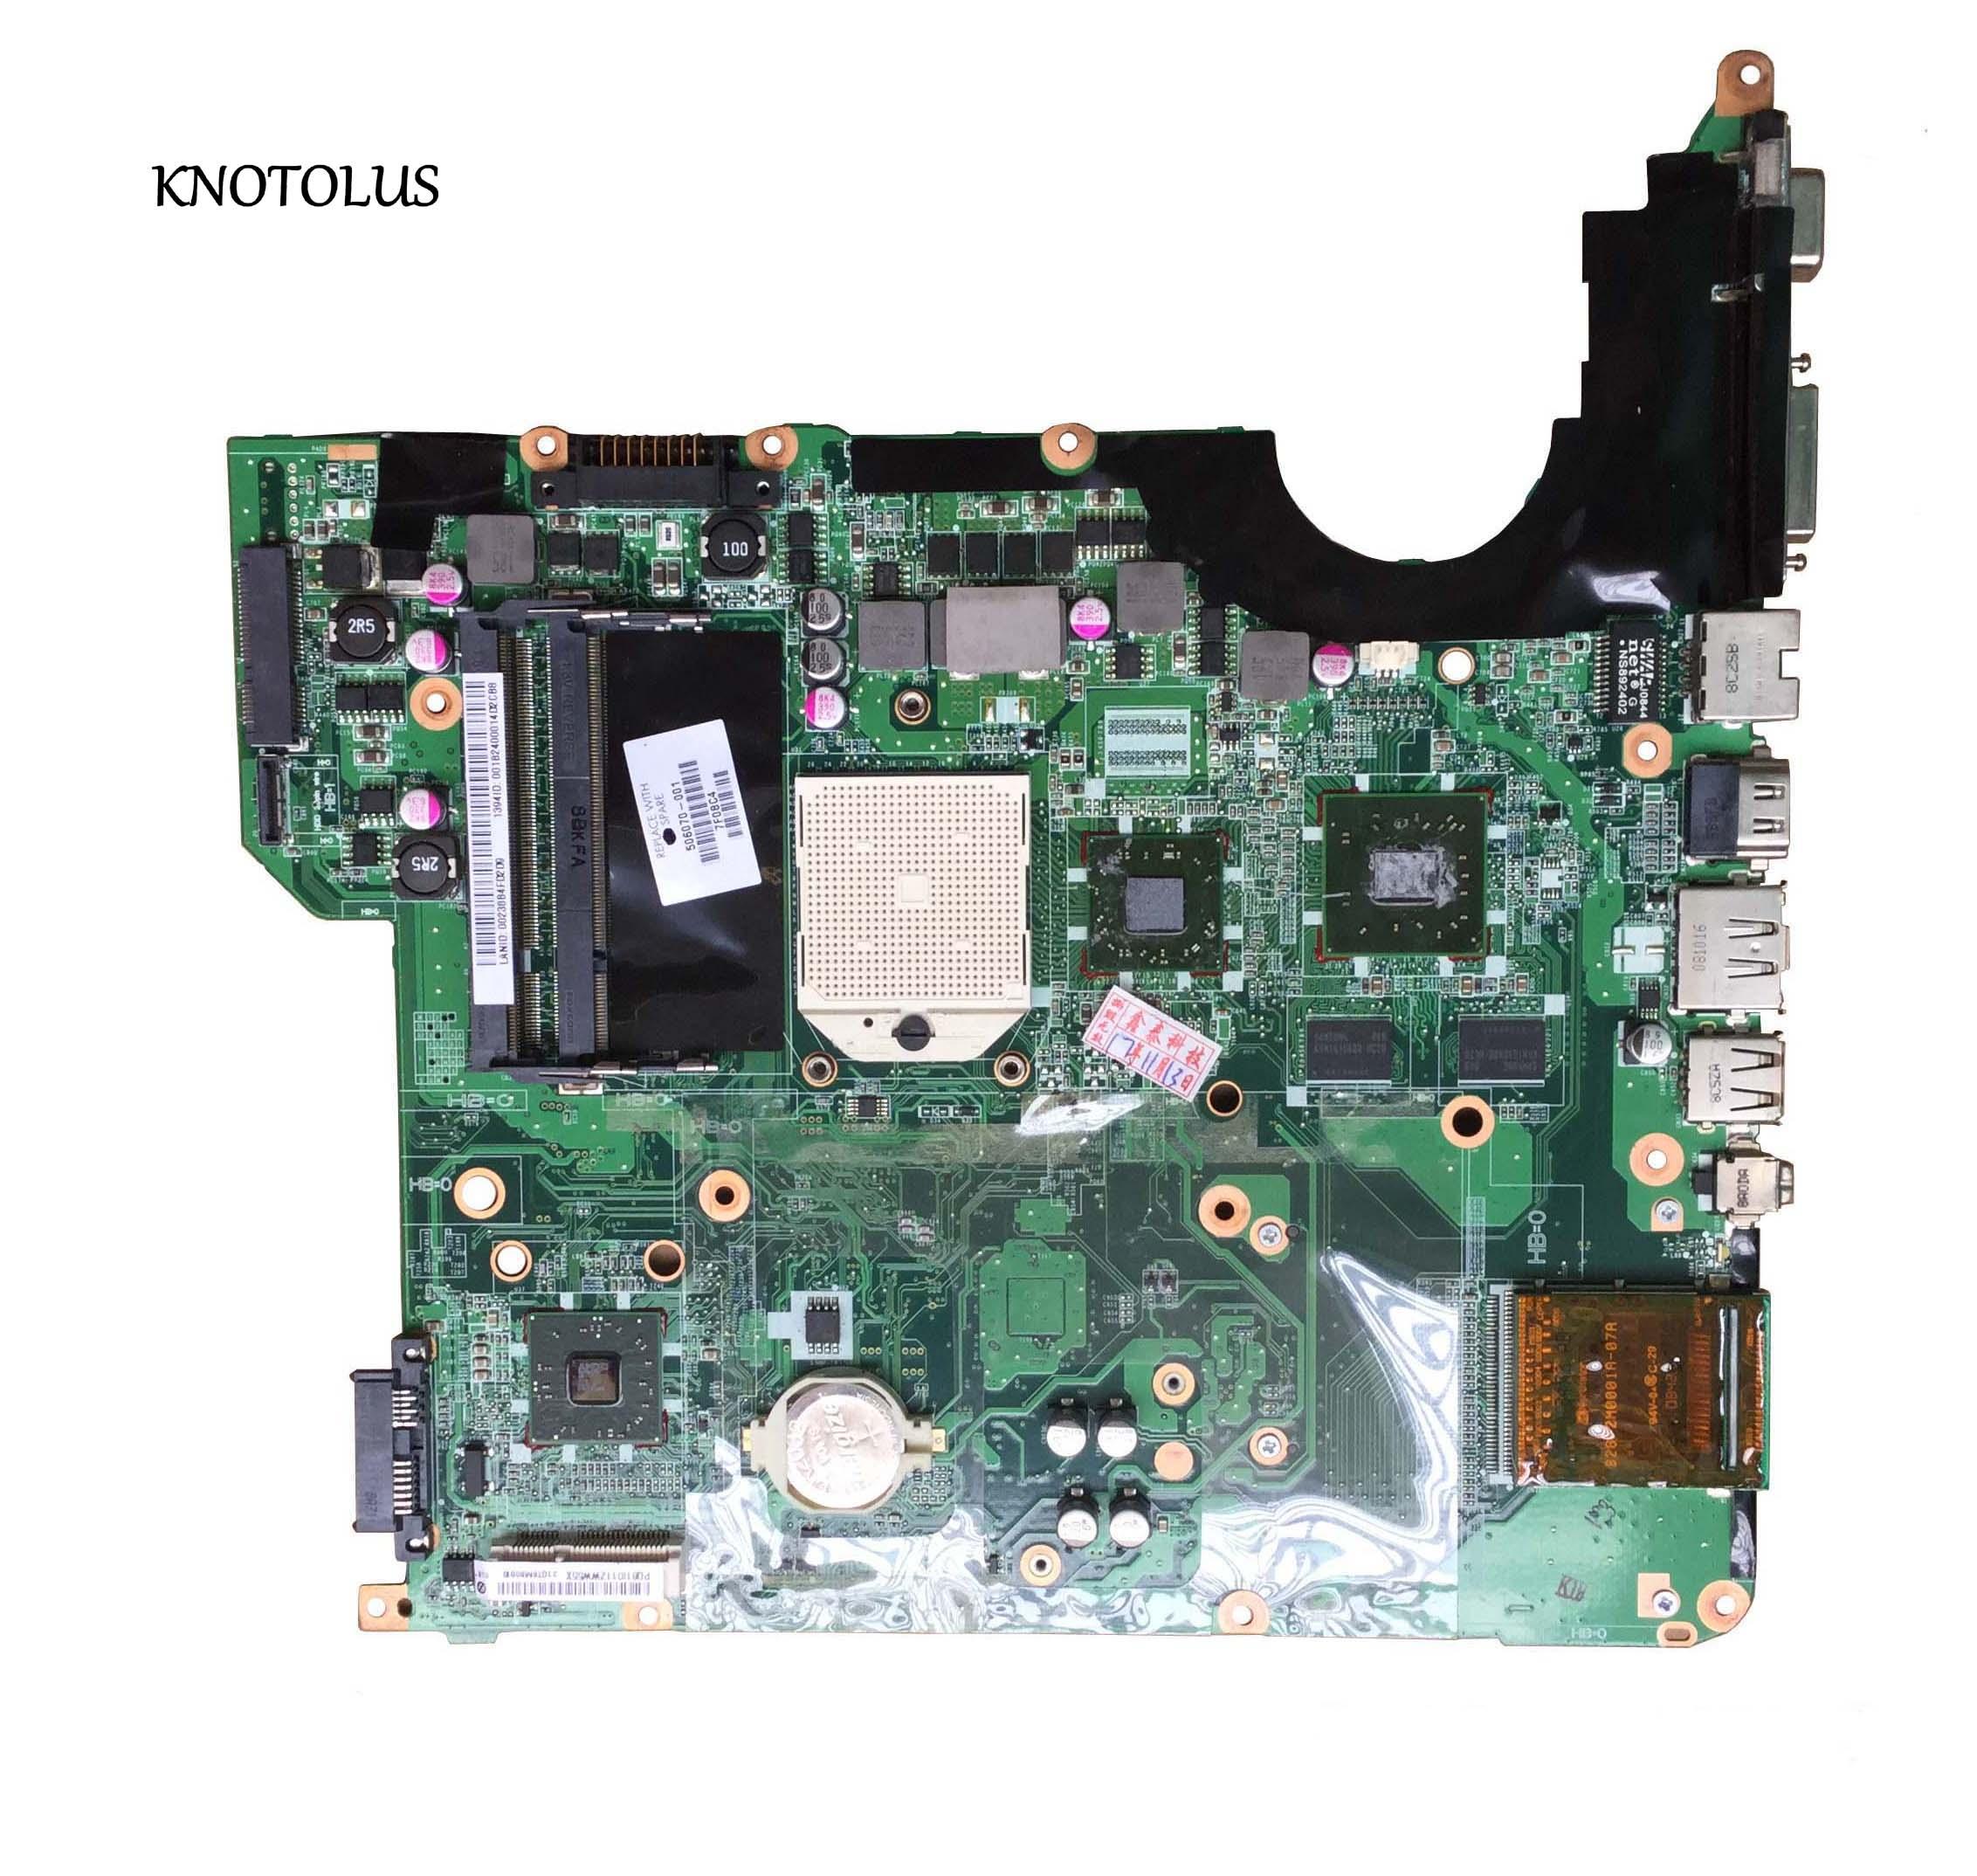 Placa madre de alta calidad 506070-001 para HP DV5 DV5-1000 placa madre de ordenador portátil probada